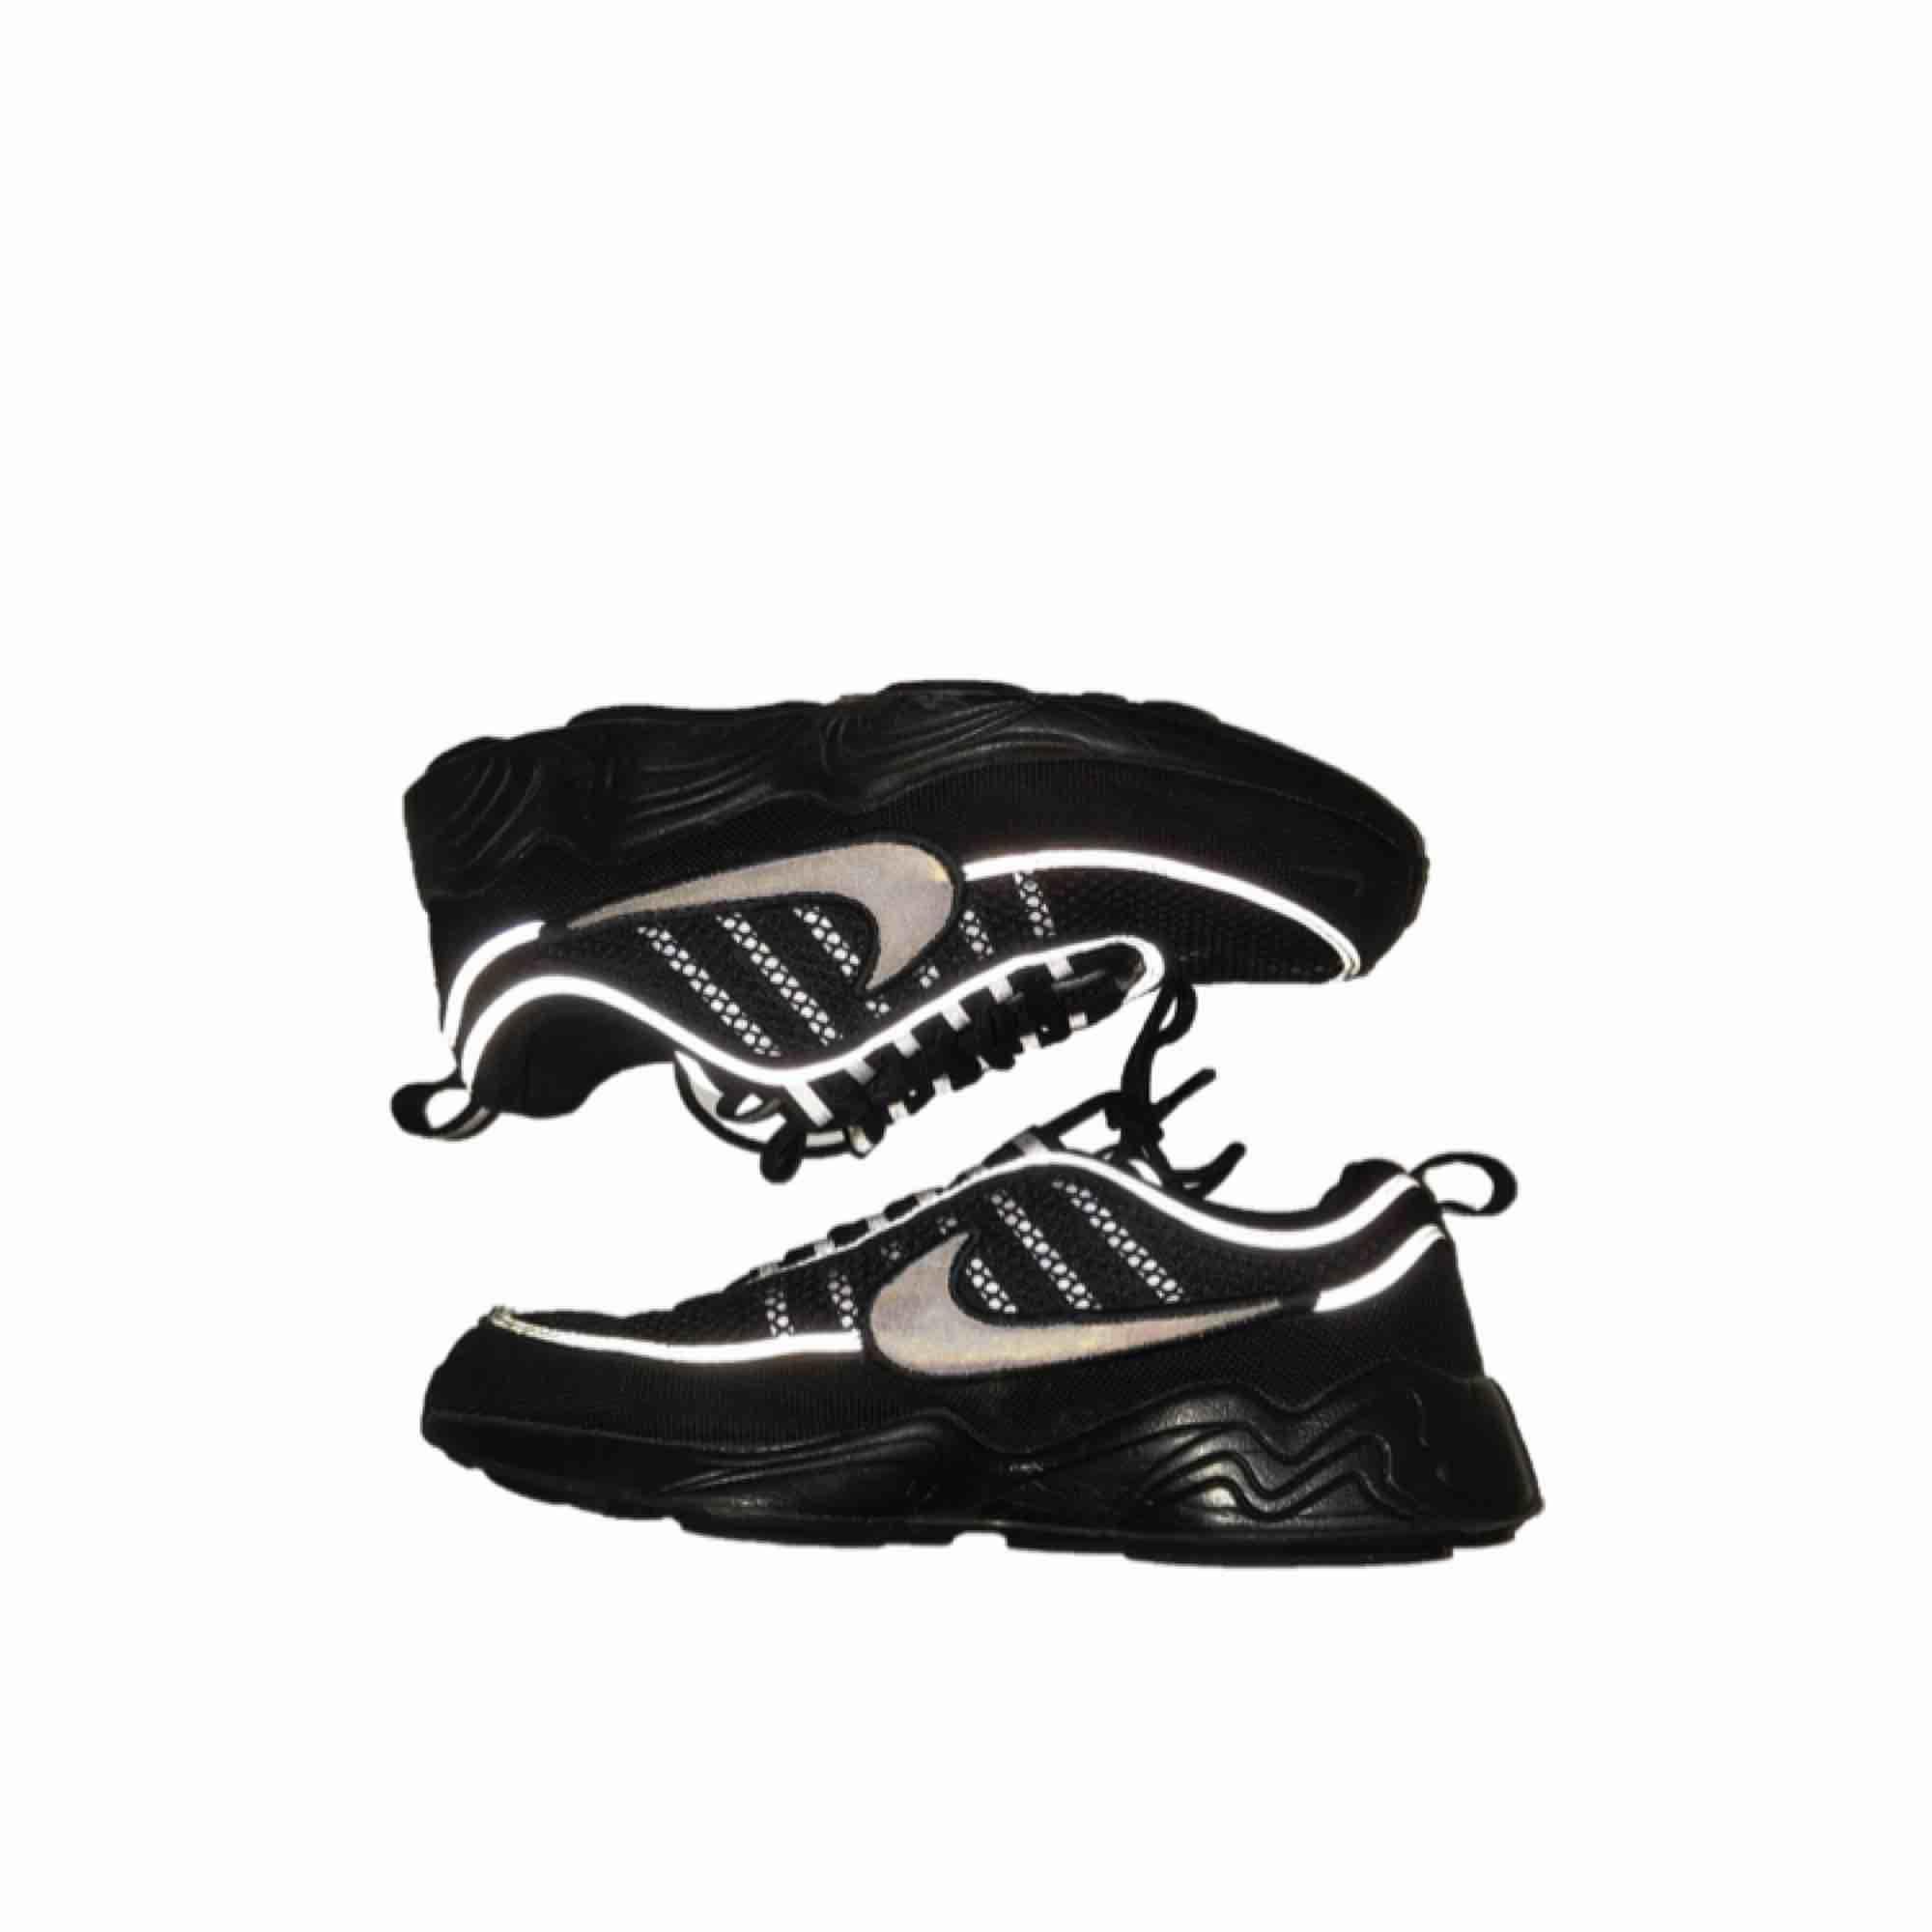 Nike Air Zoom spiridon 16 black.. size 40.5 skick:8/10 nypris:1599kr., 500kr. Skor.